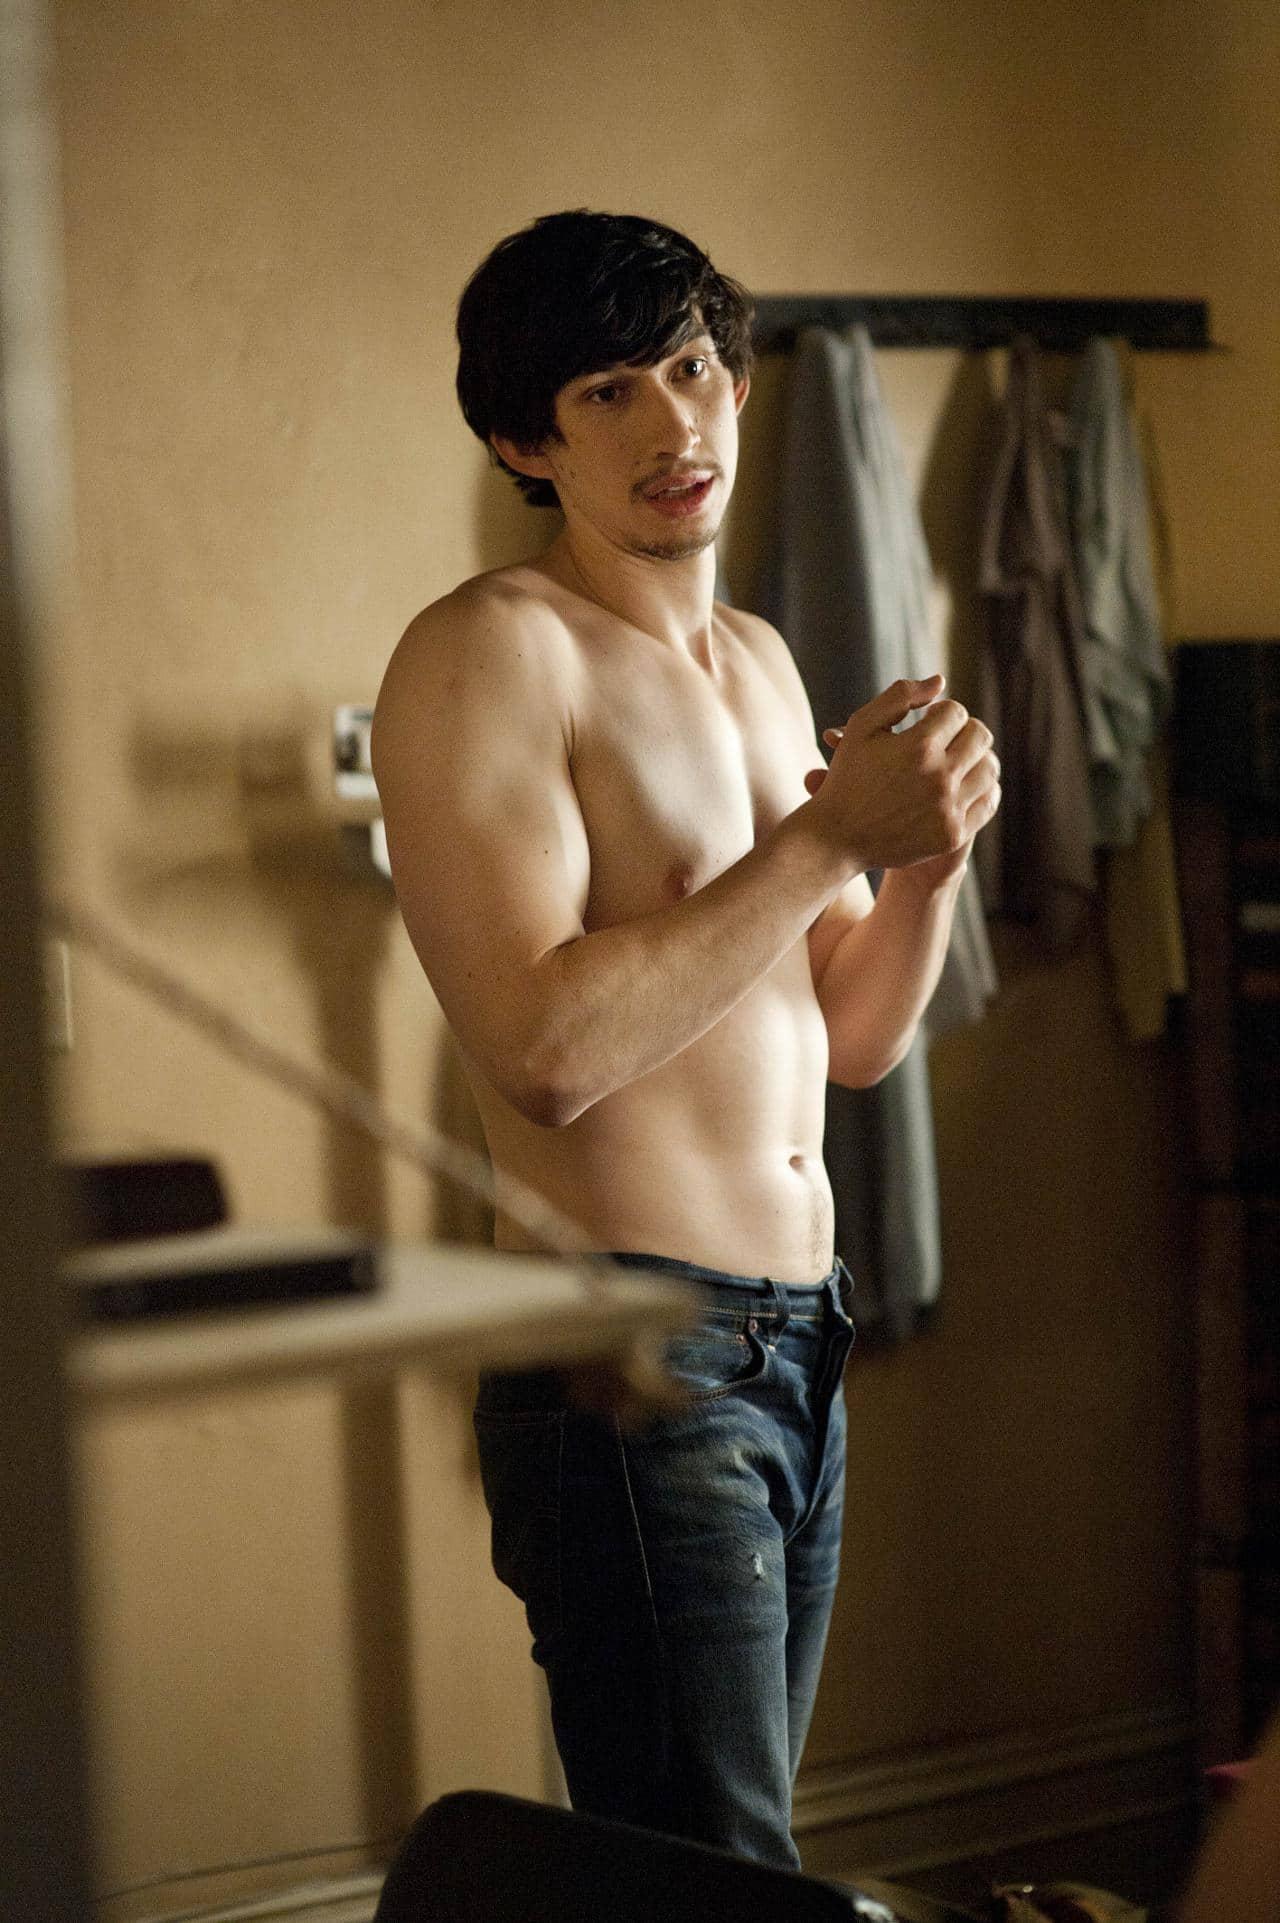 Adam Driver attractive shirtless body